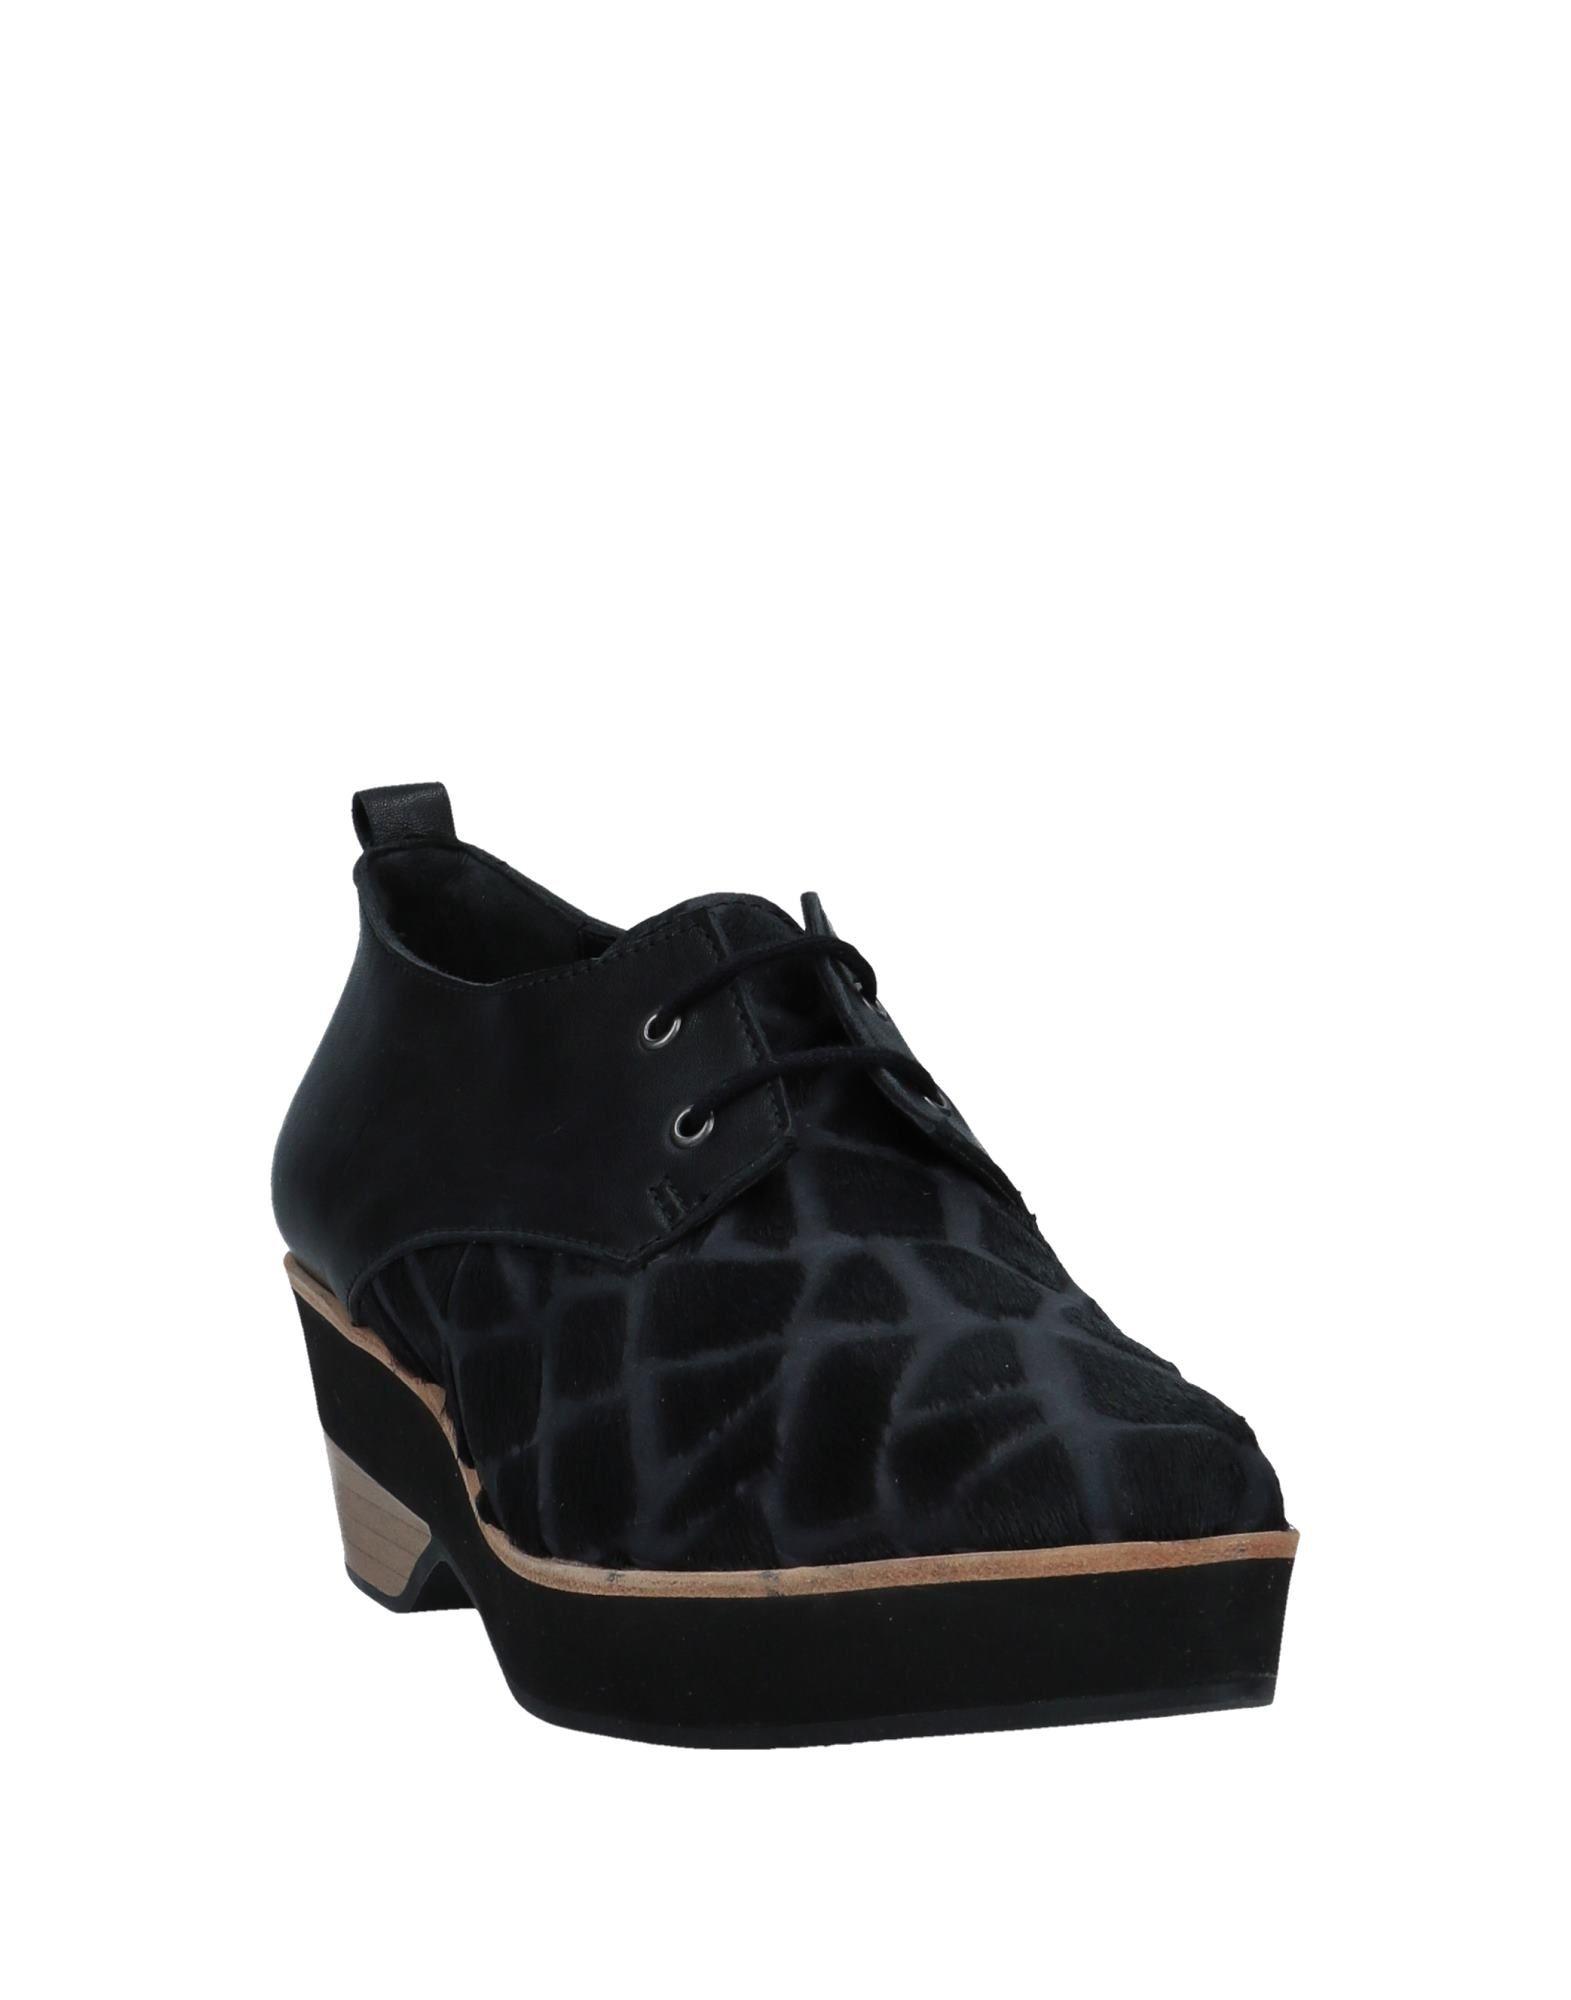 Gut um Schnürschuhe billige Schuhe zu tragenAnaid Kupuri Schnürschuhe um Damen  11552511SA c3869e